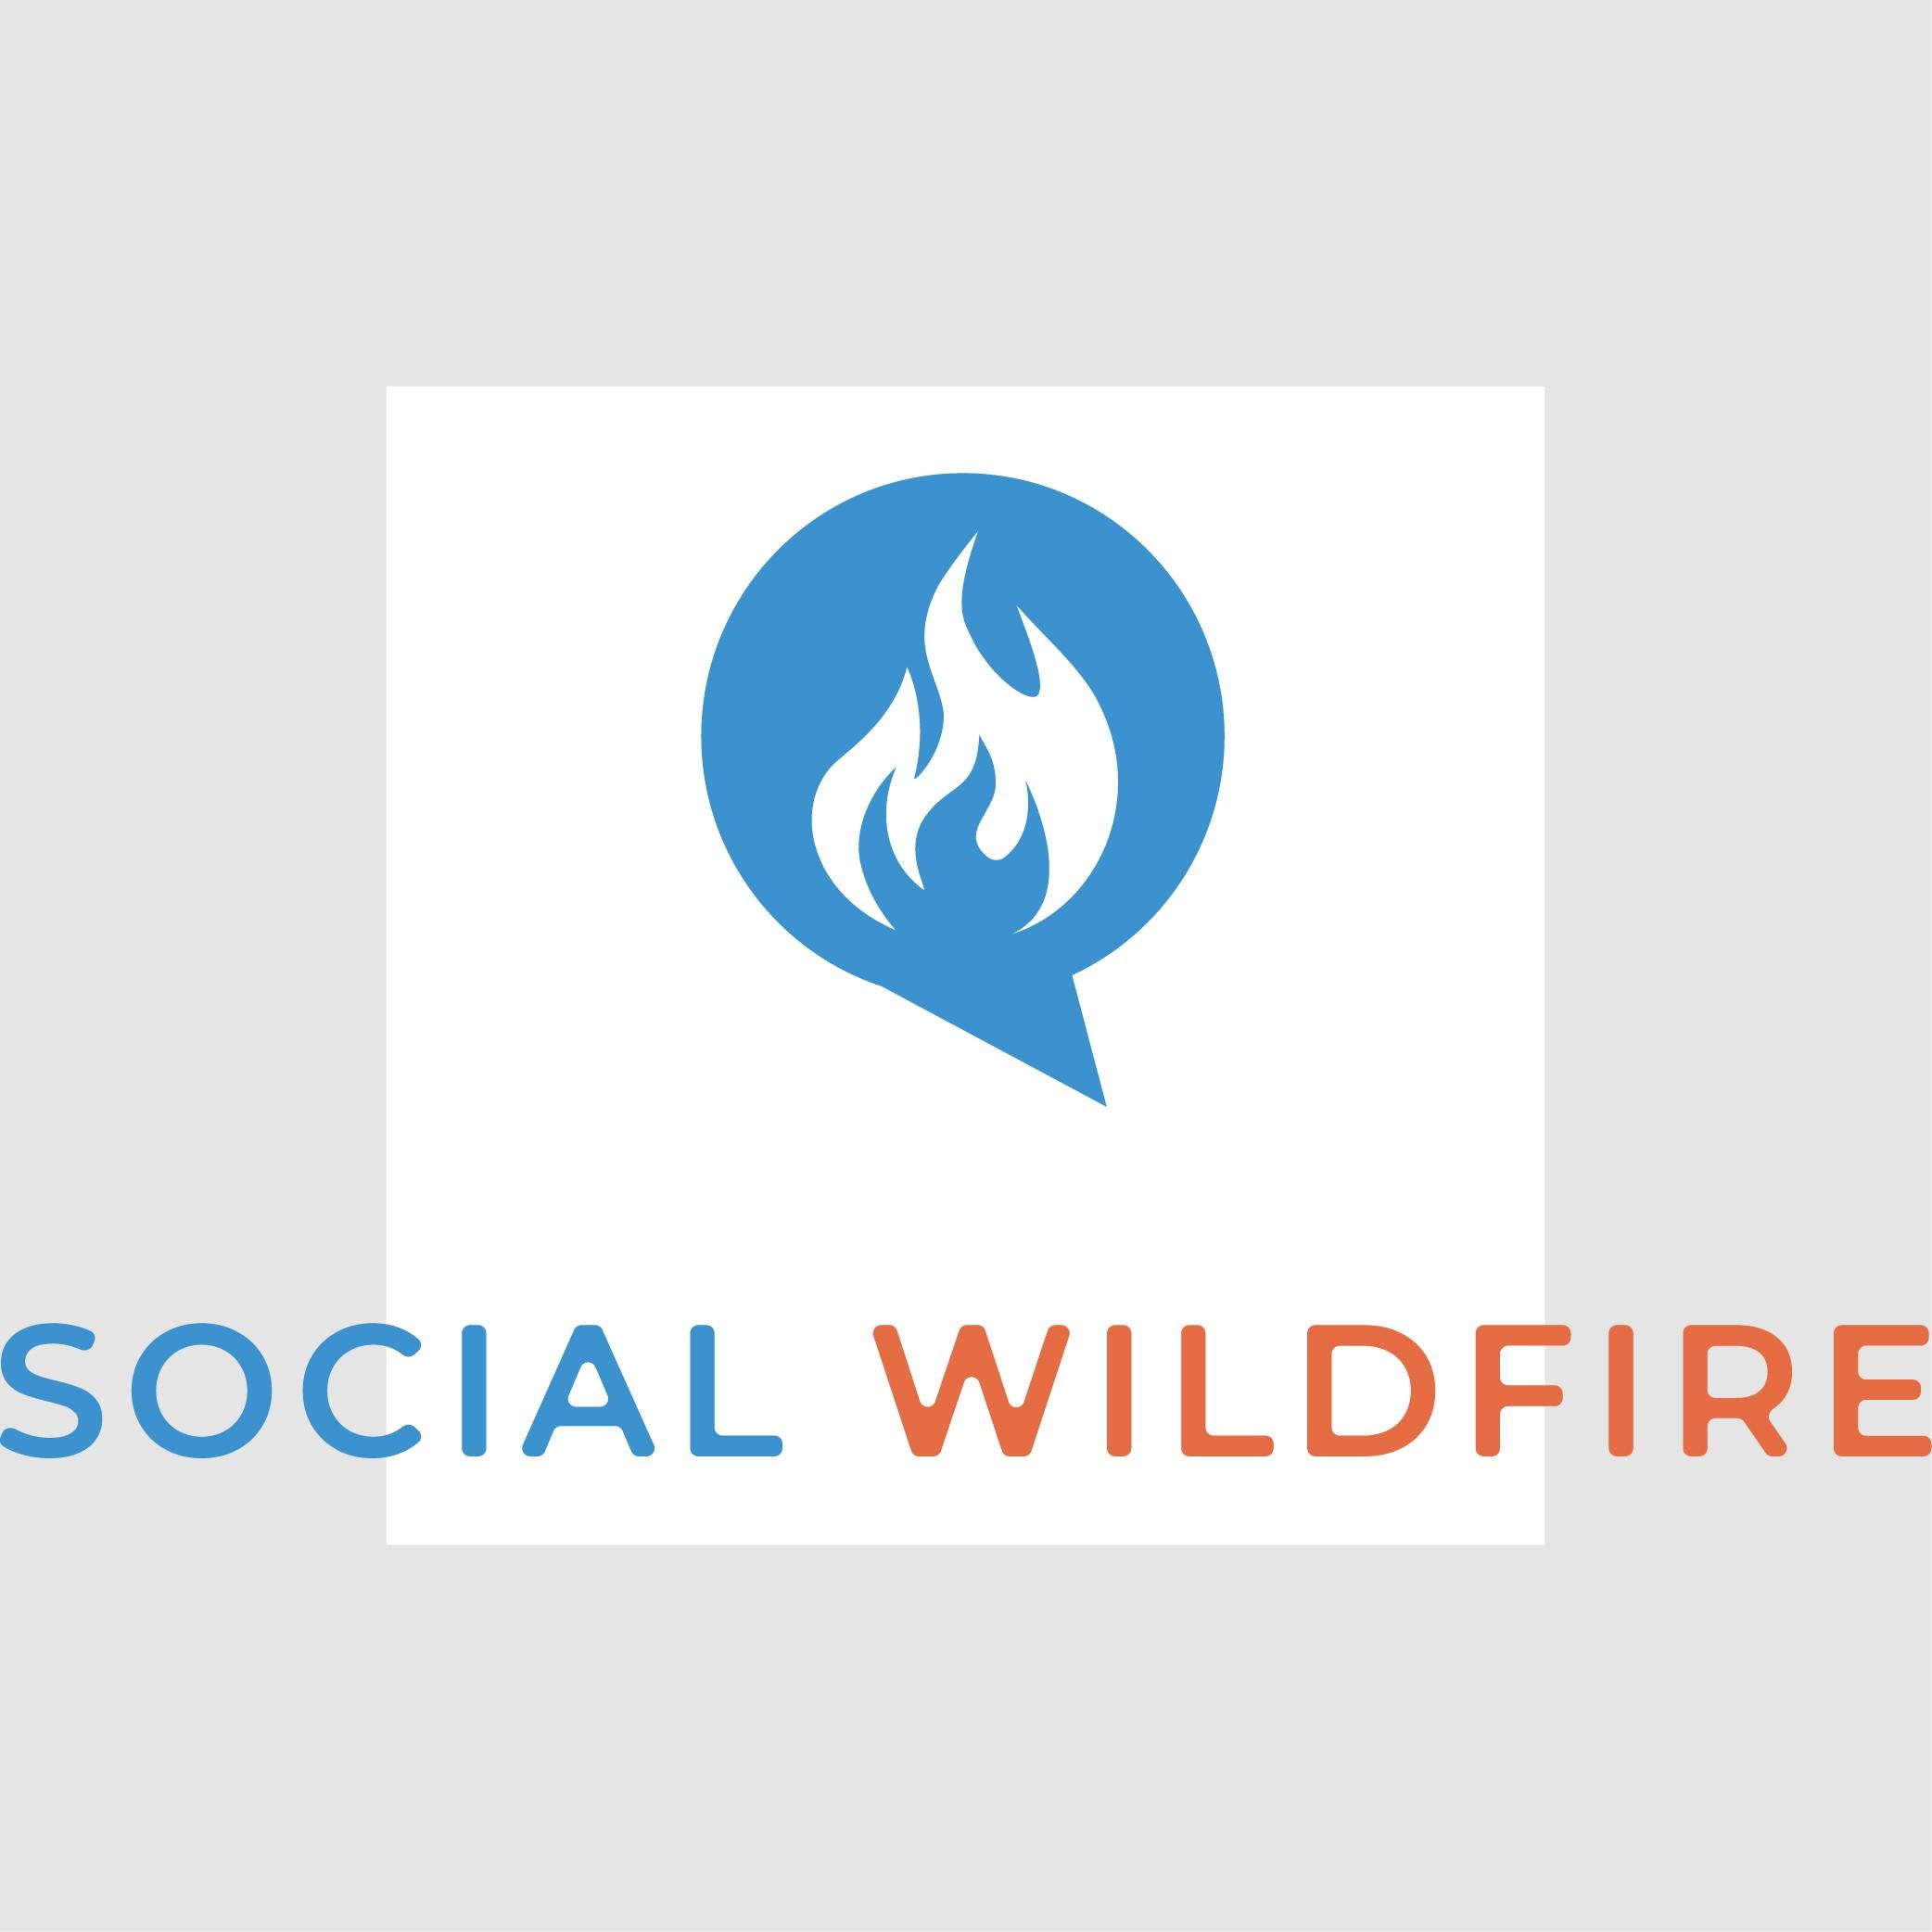 Powerful & Minimalistic Logo Needed For Social Media Company